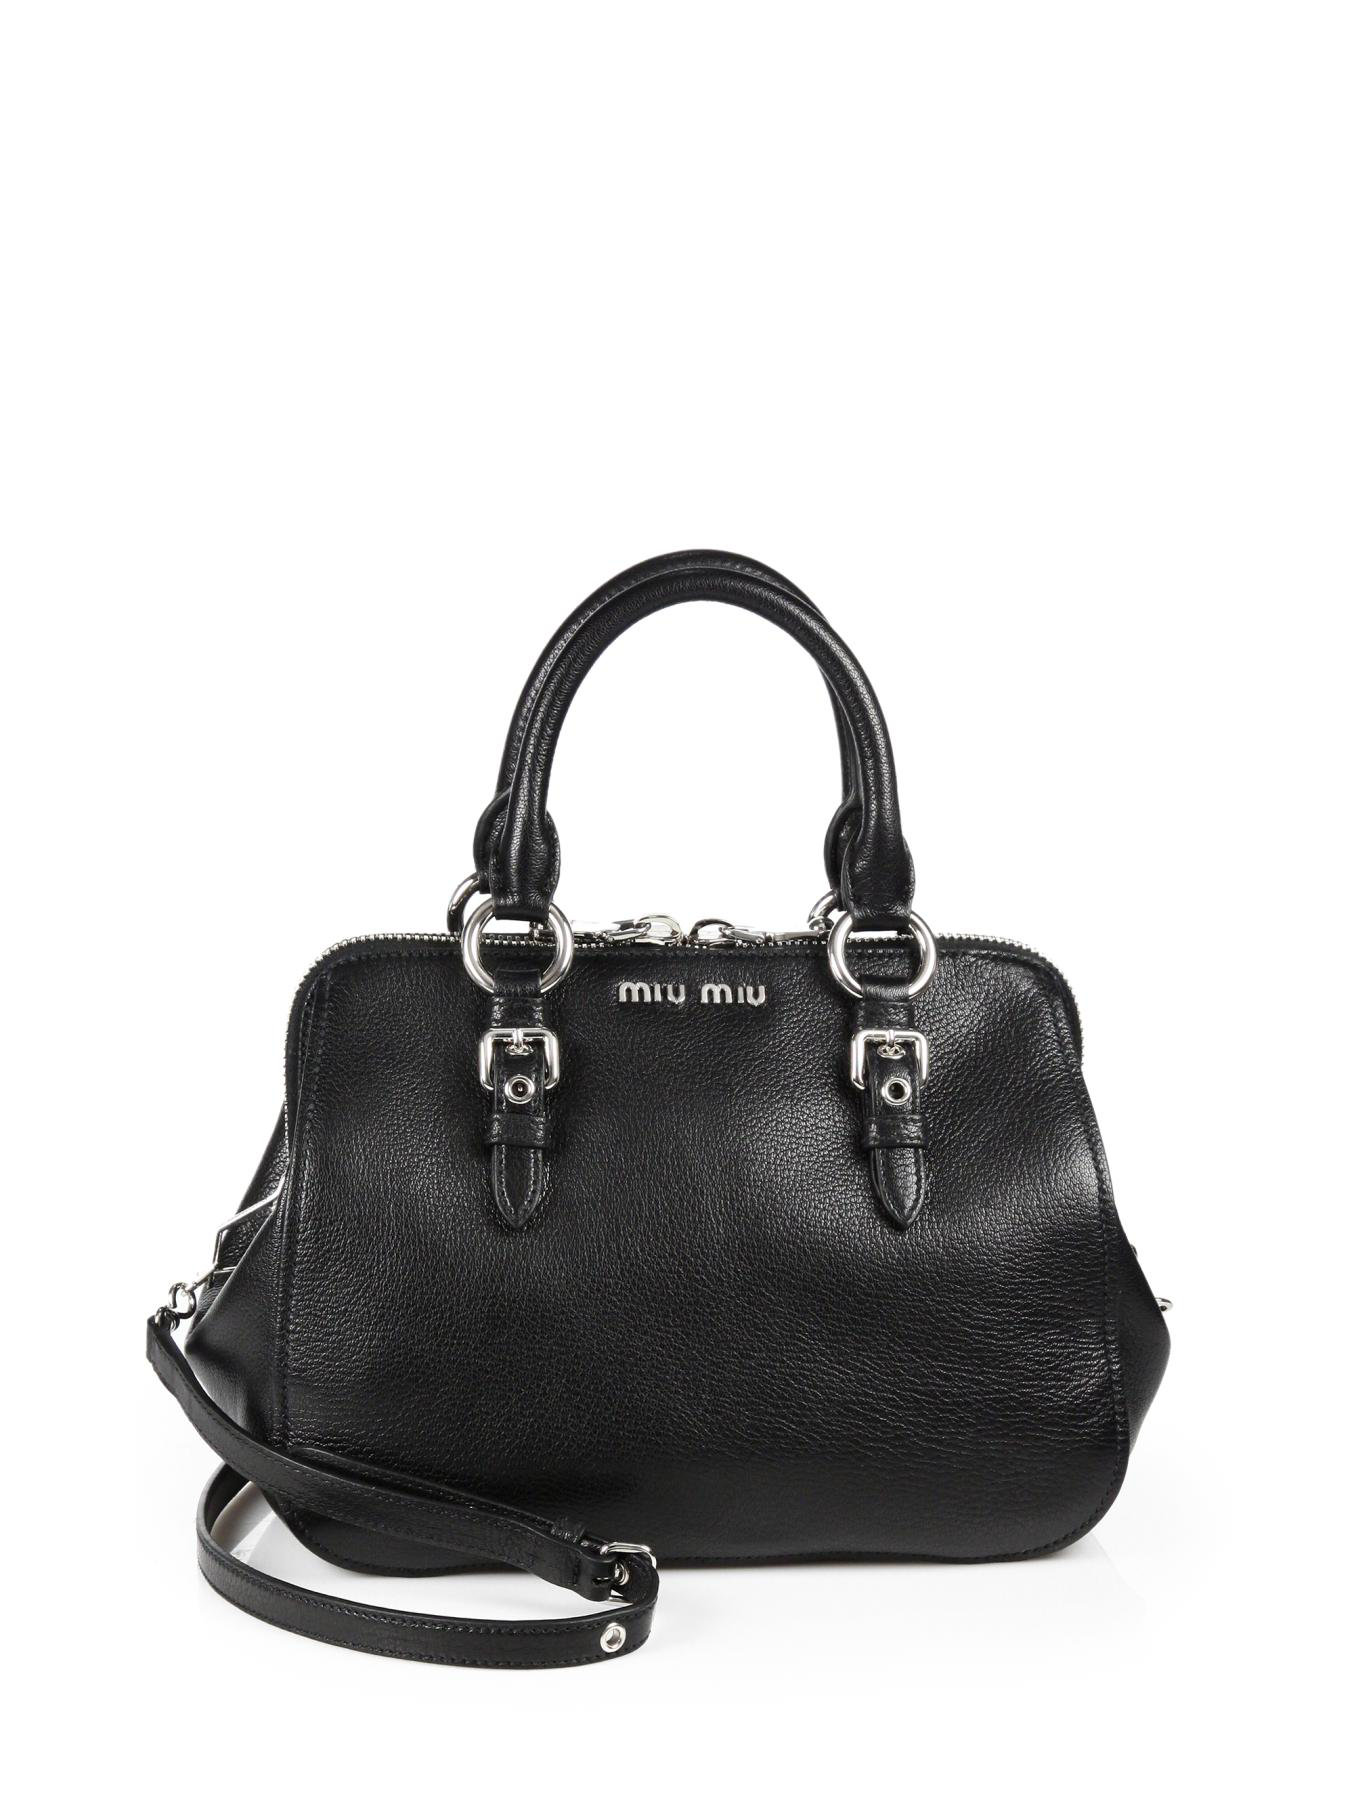 086ff6b9cc7 Miu Miu Madras Top Handle Bowling Bag in Black - Lyst